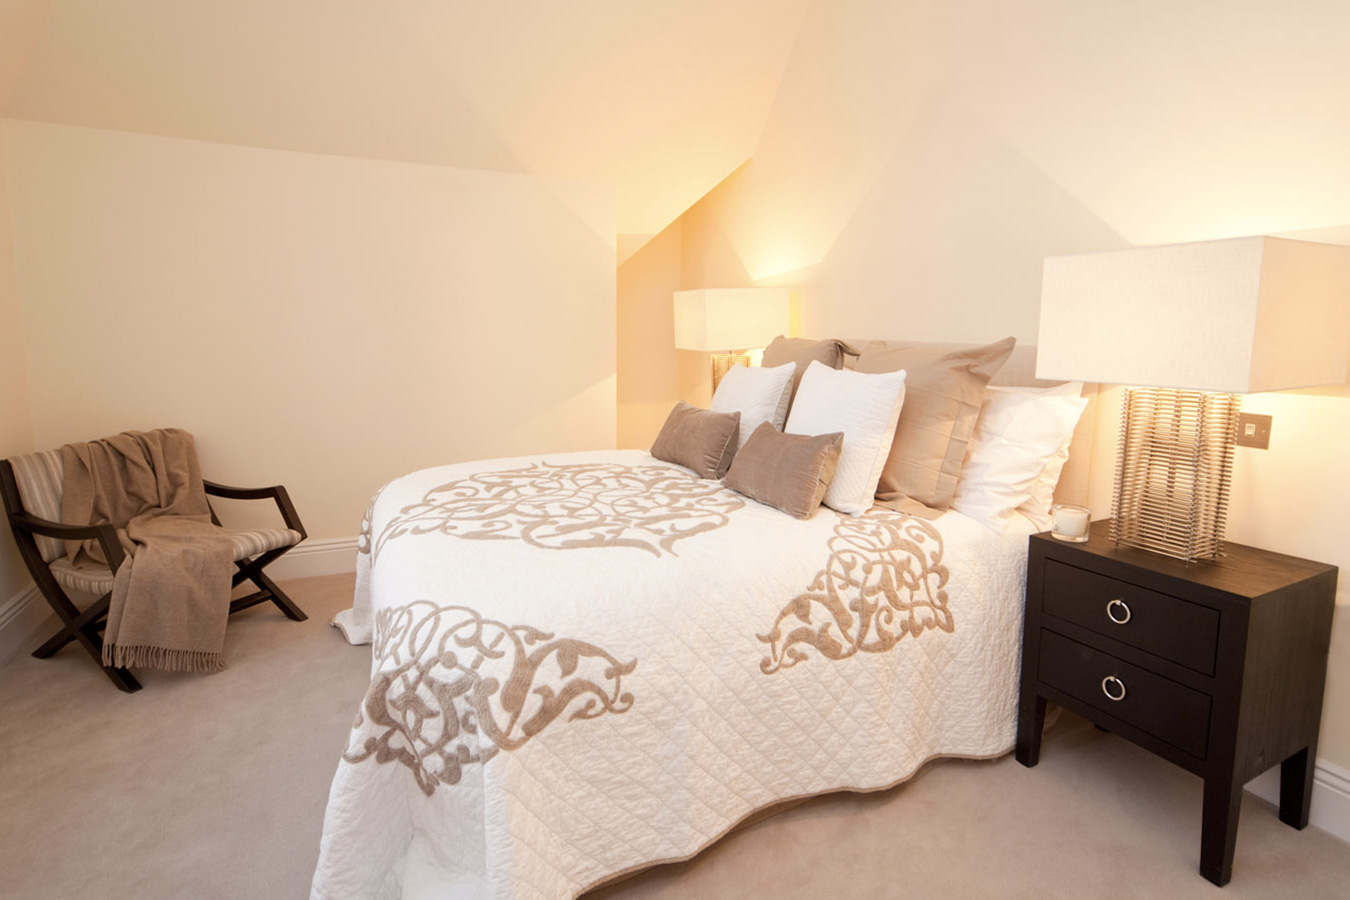 Design Box London - Interior Design - Richmond Park Home, TW10 - Bedroom